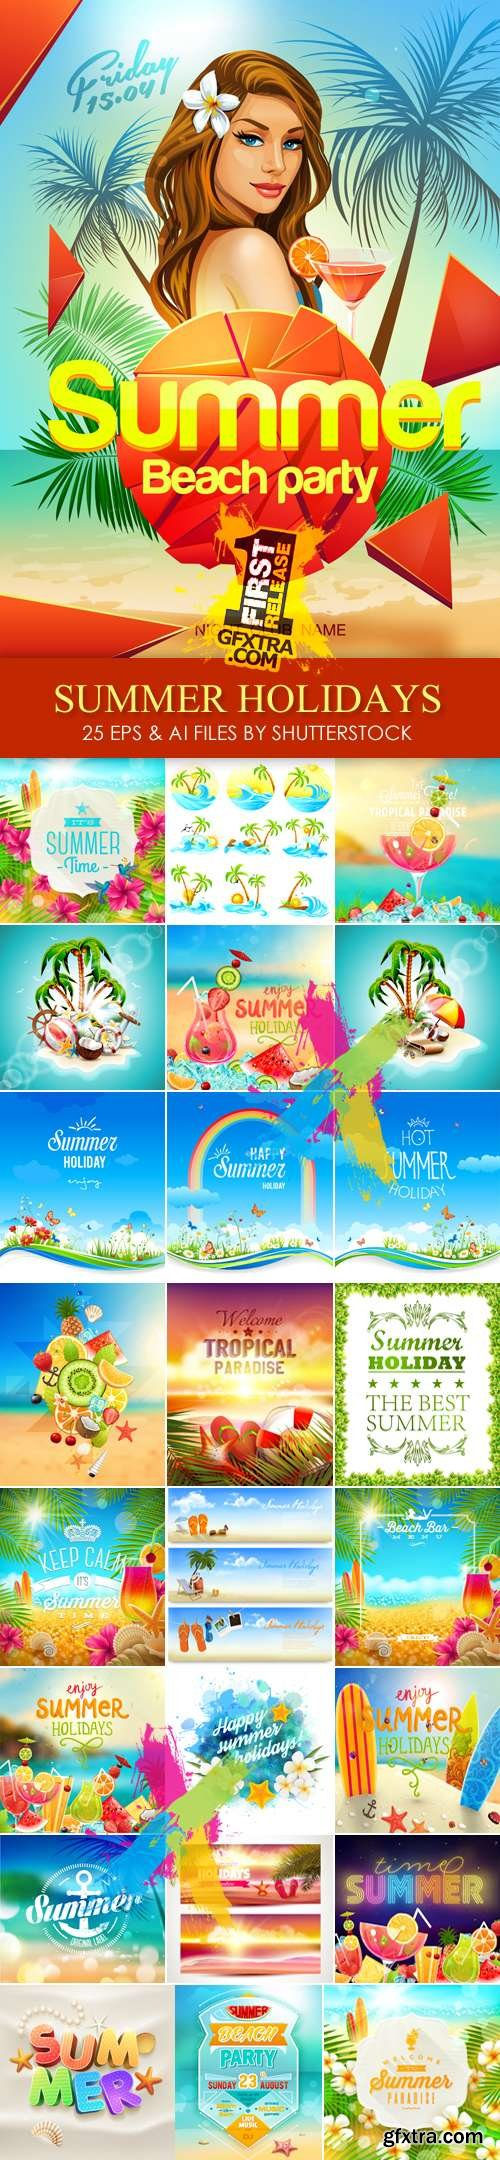 Stock Vector - Summer Tropical Holidays